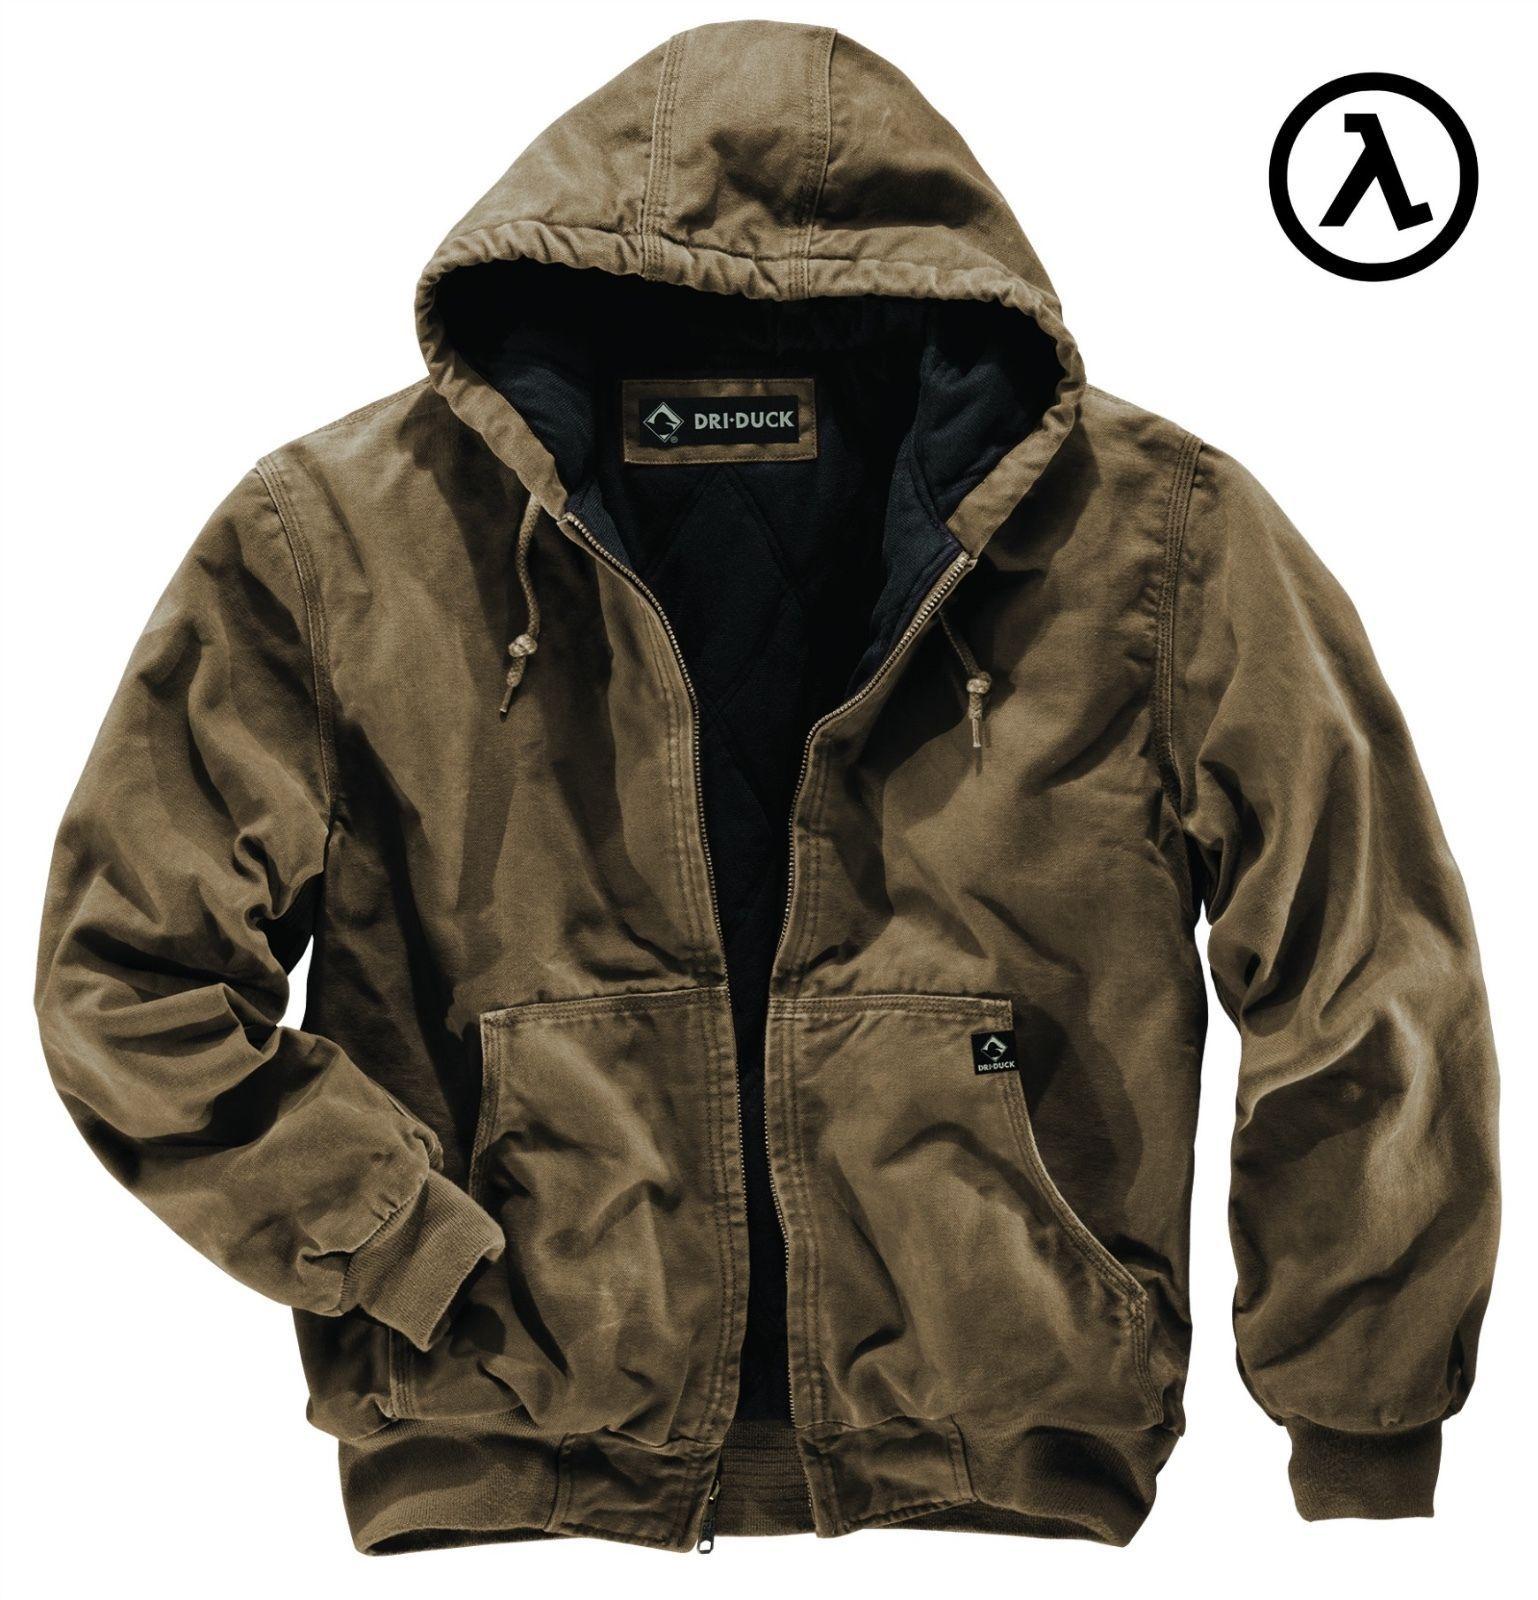 Dri Duck Cheyenne 5020 Men S Work Wear Jacket All Sizes New Mens Jackets Work Jackets Jackets [ 1600 x 1538 Pixel ]